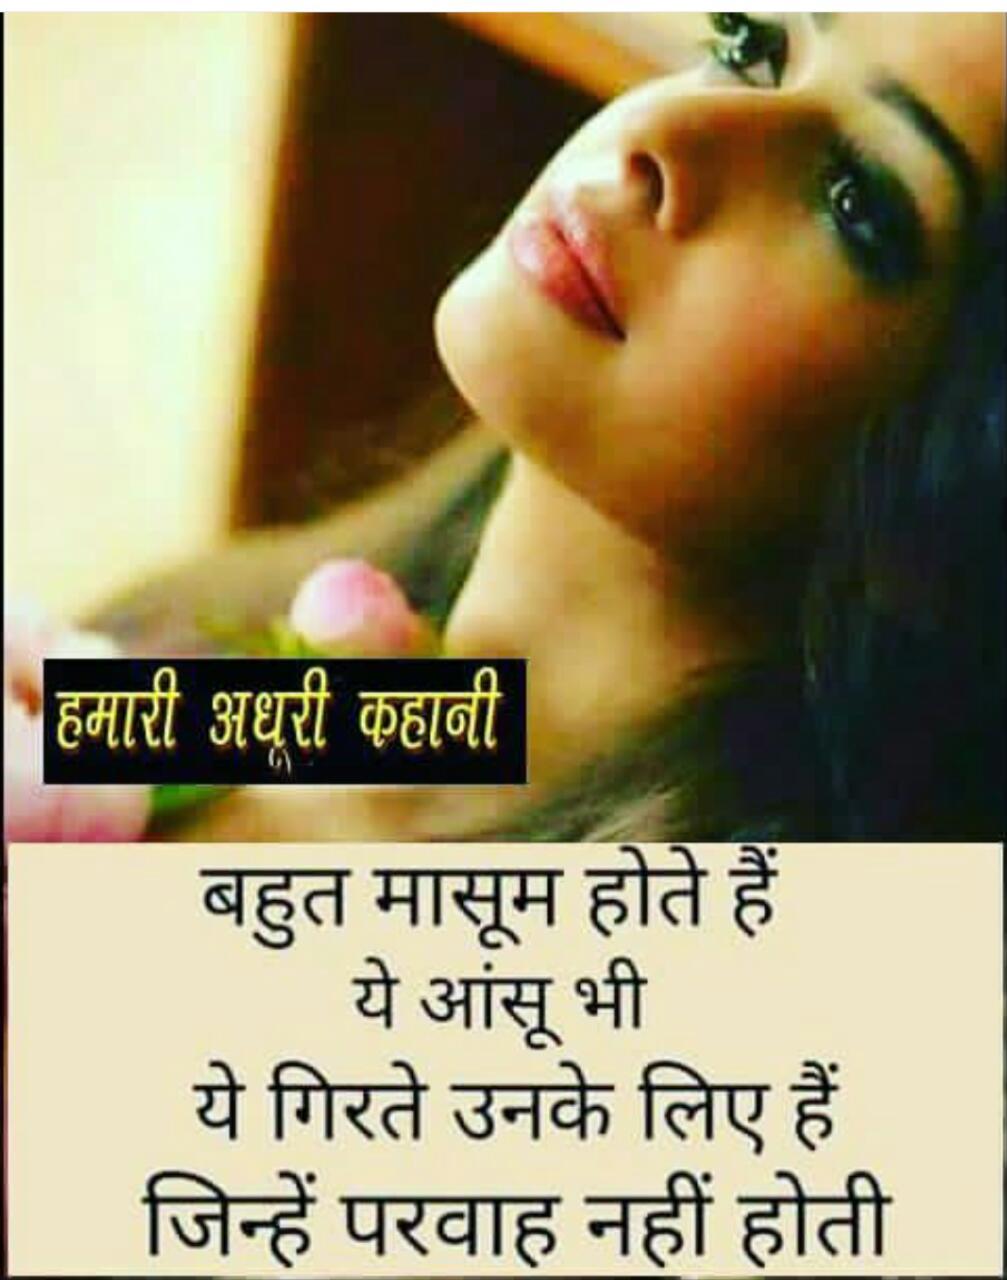 sad shayari image hamari adhoori kahani paagalwords blogspot com